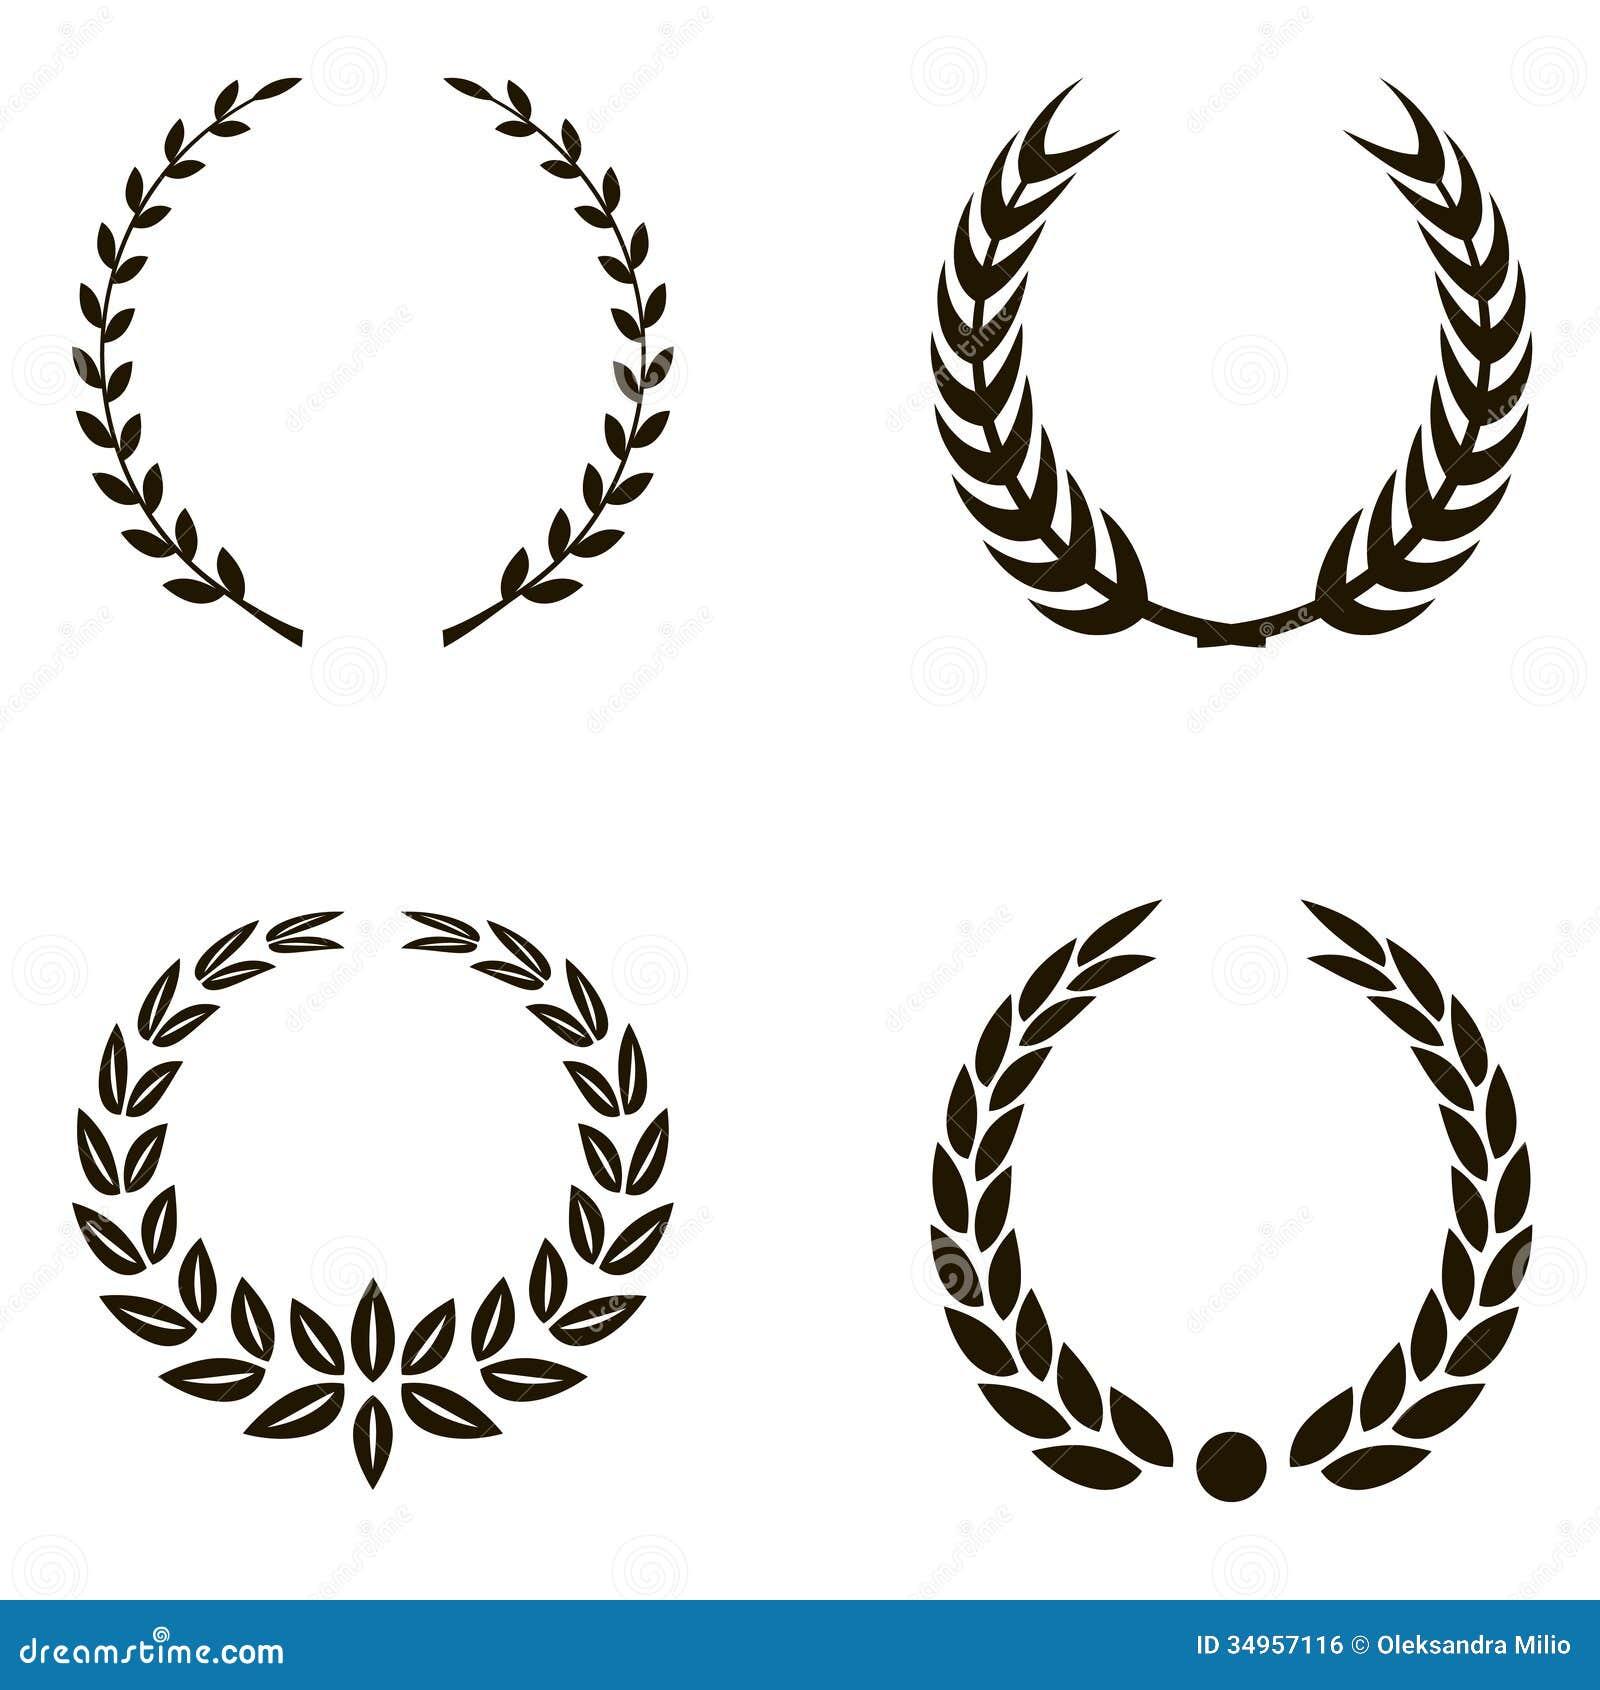 Laurel Wreaths Royalty Free Stock Image - Image: 34957116